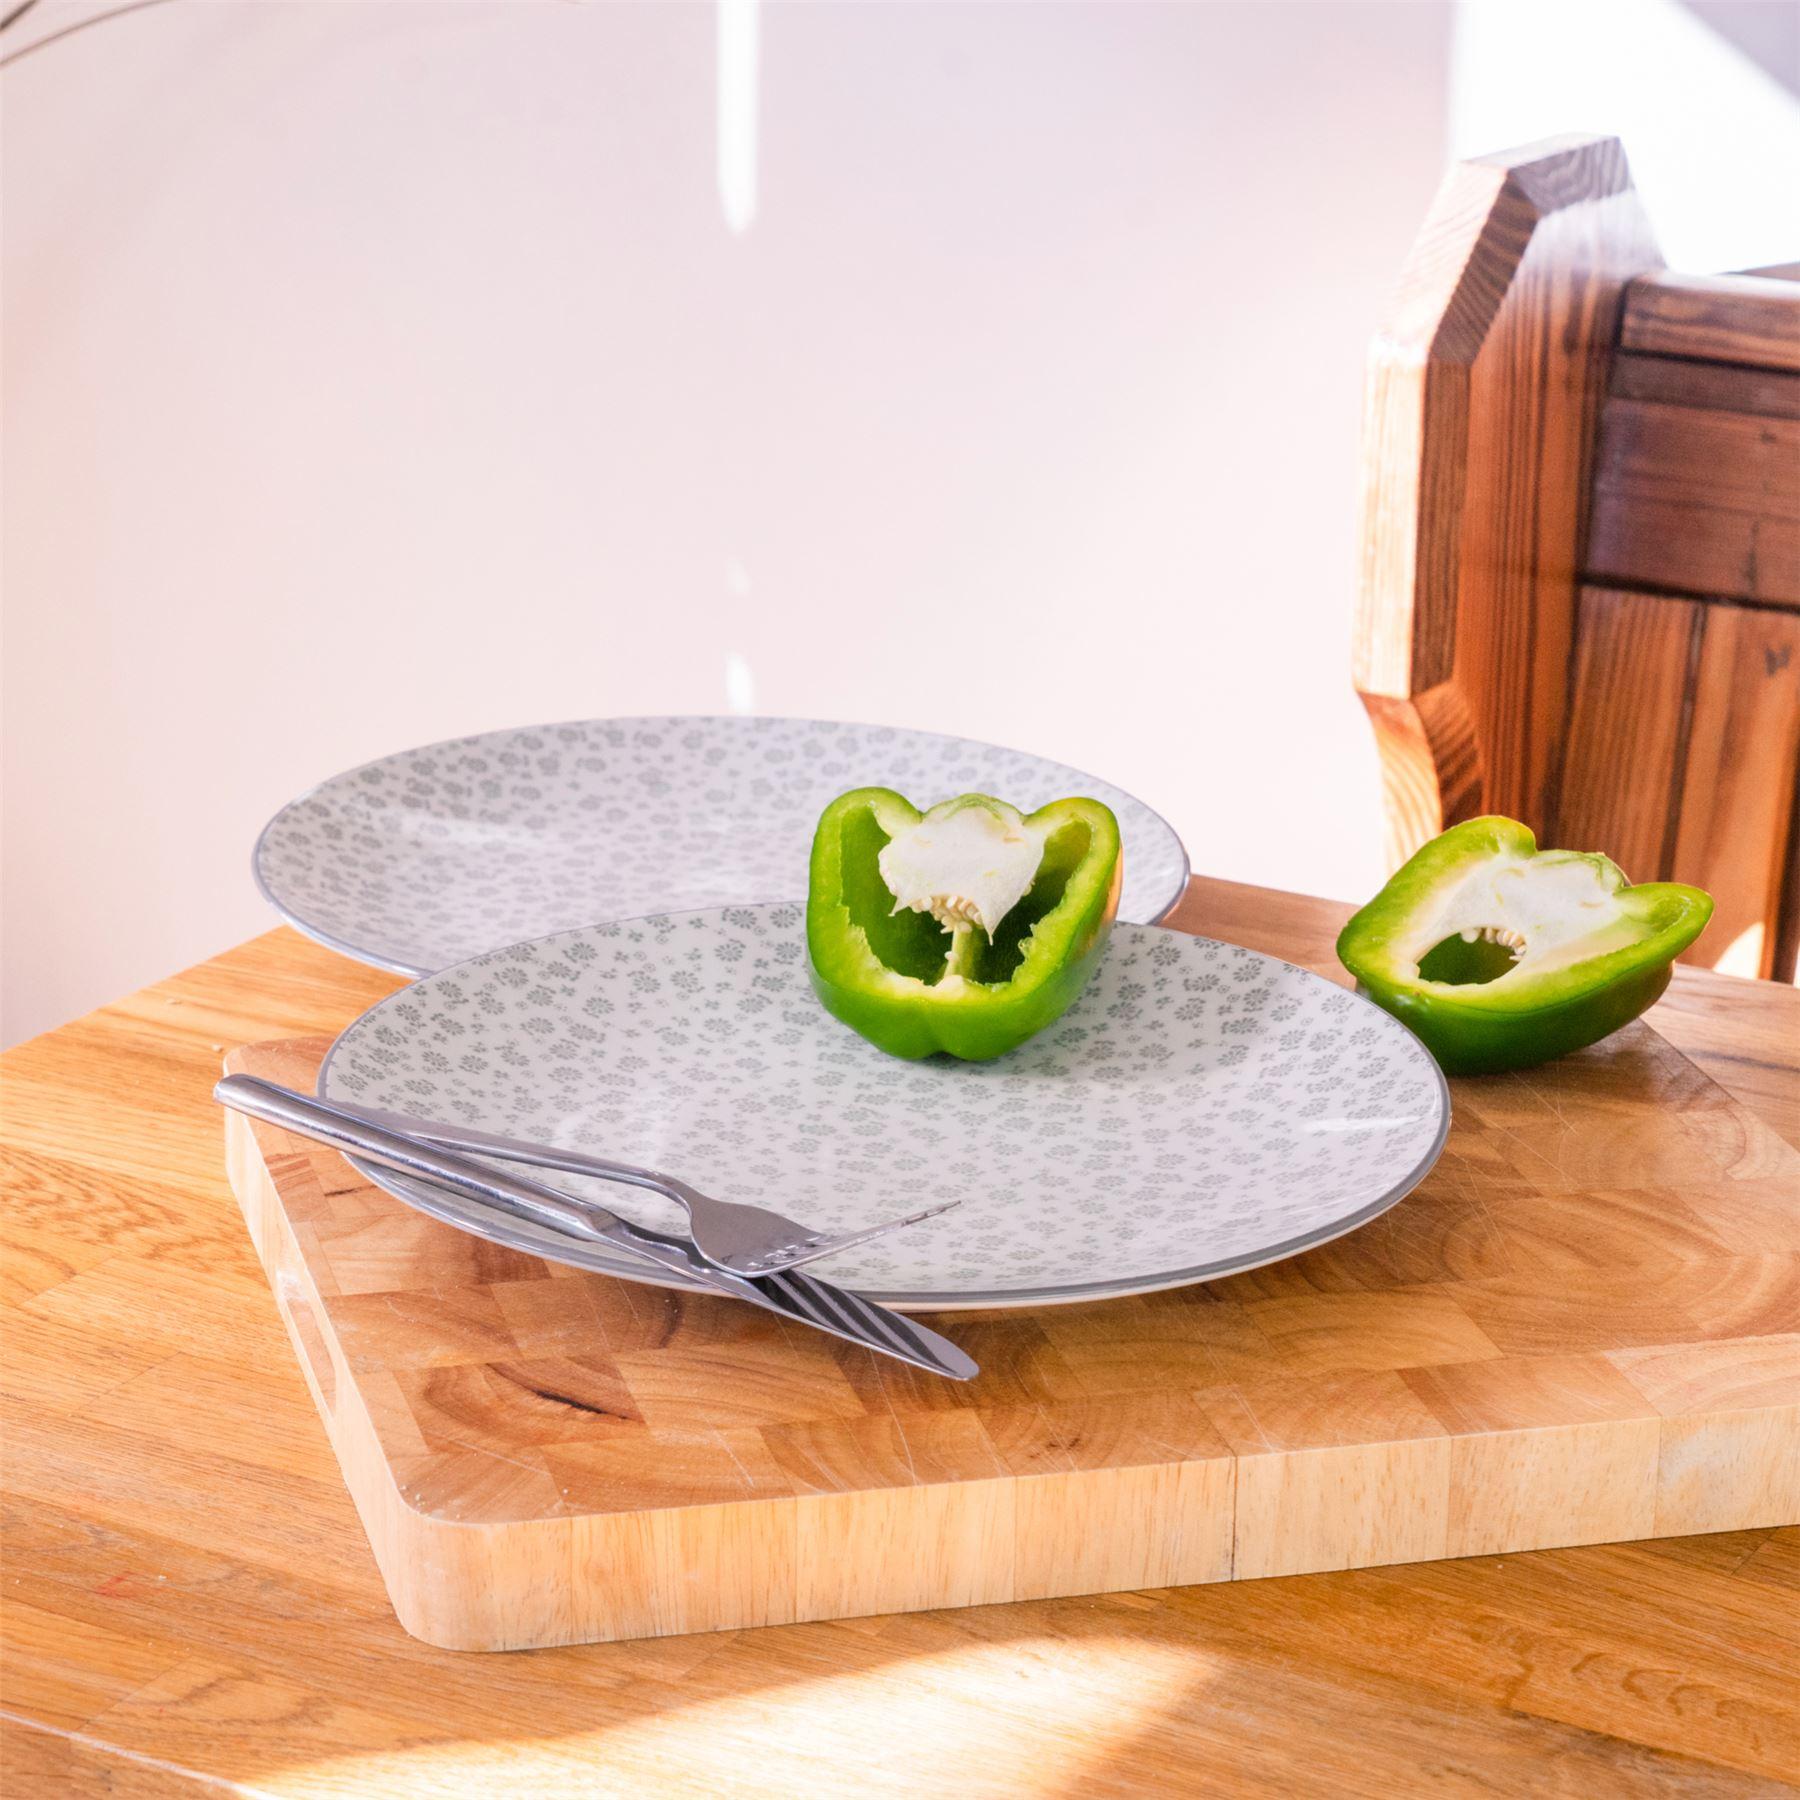 essteller set teller mit blumendesign 265mm wei. Black Bedroom Furniture Sets. Home Design Ideas